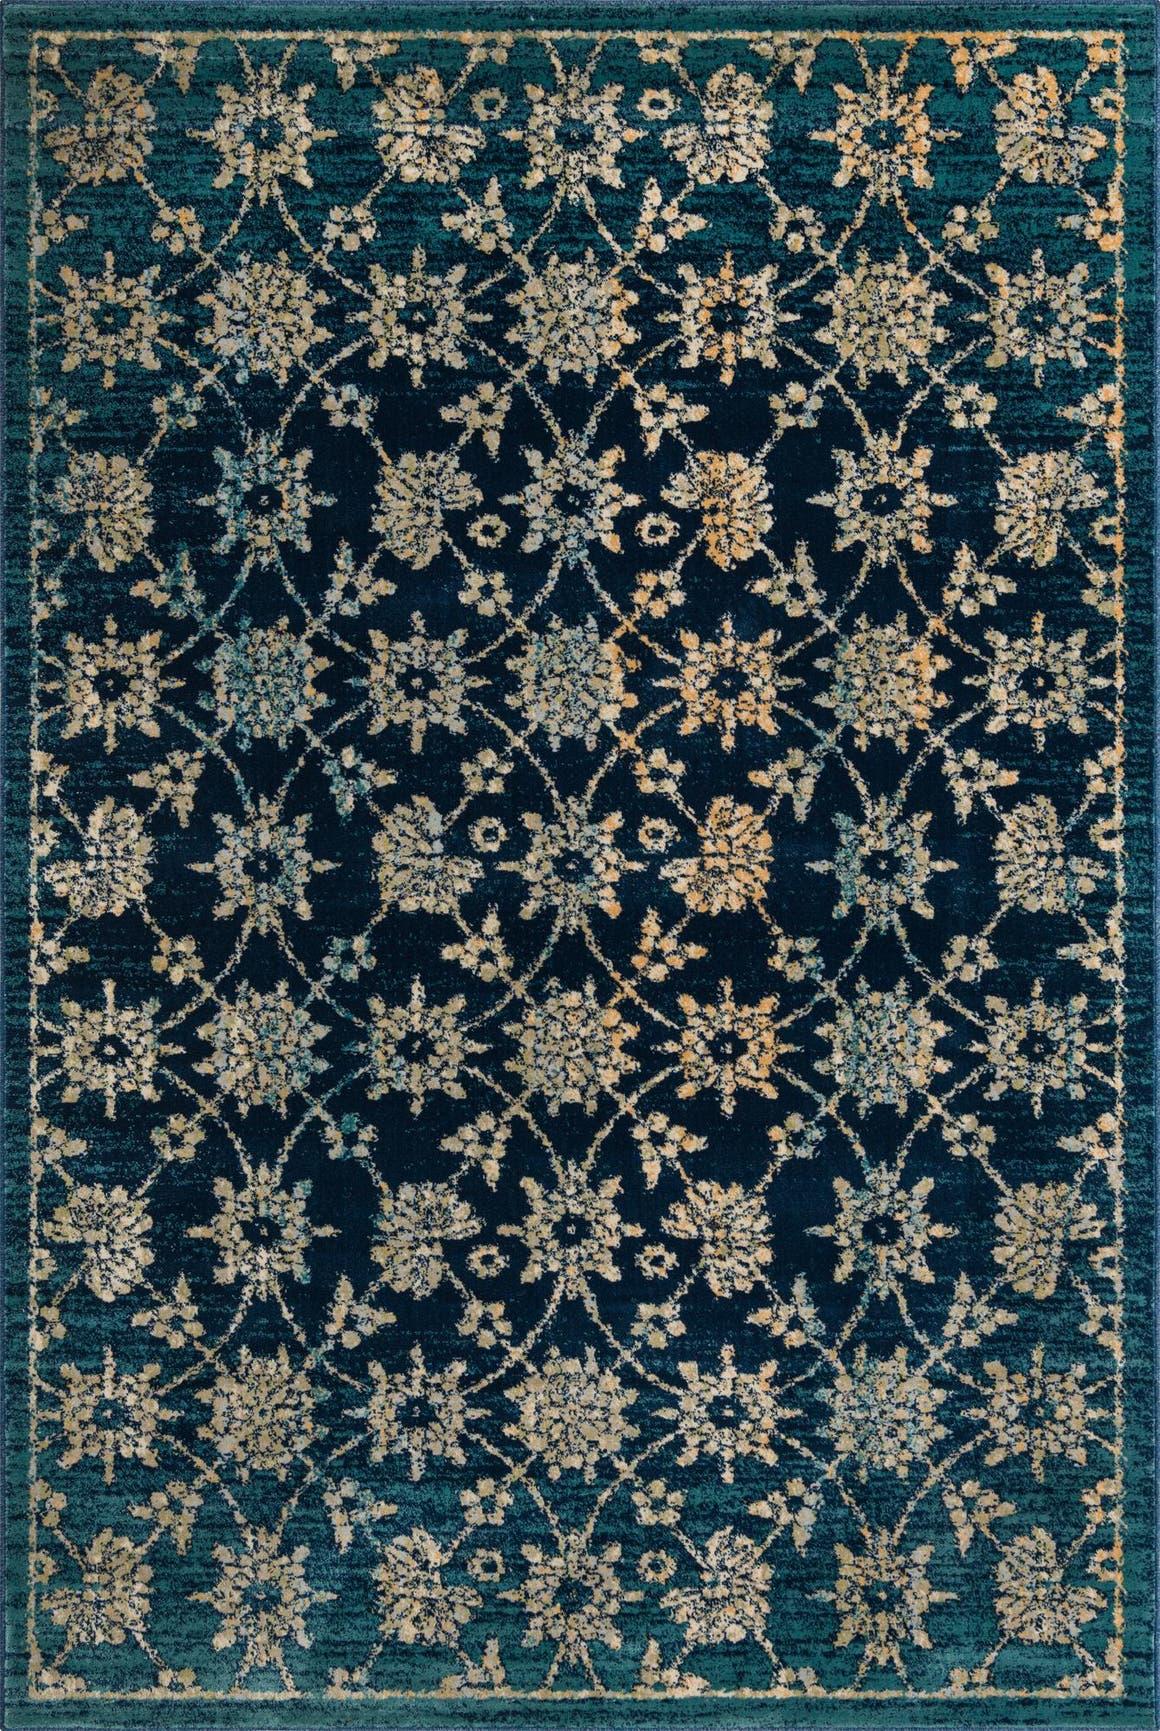 6' x 9' Stockholm Rug main image